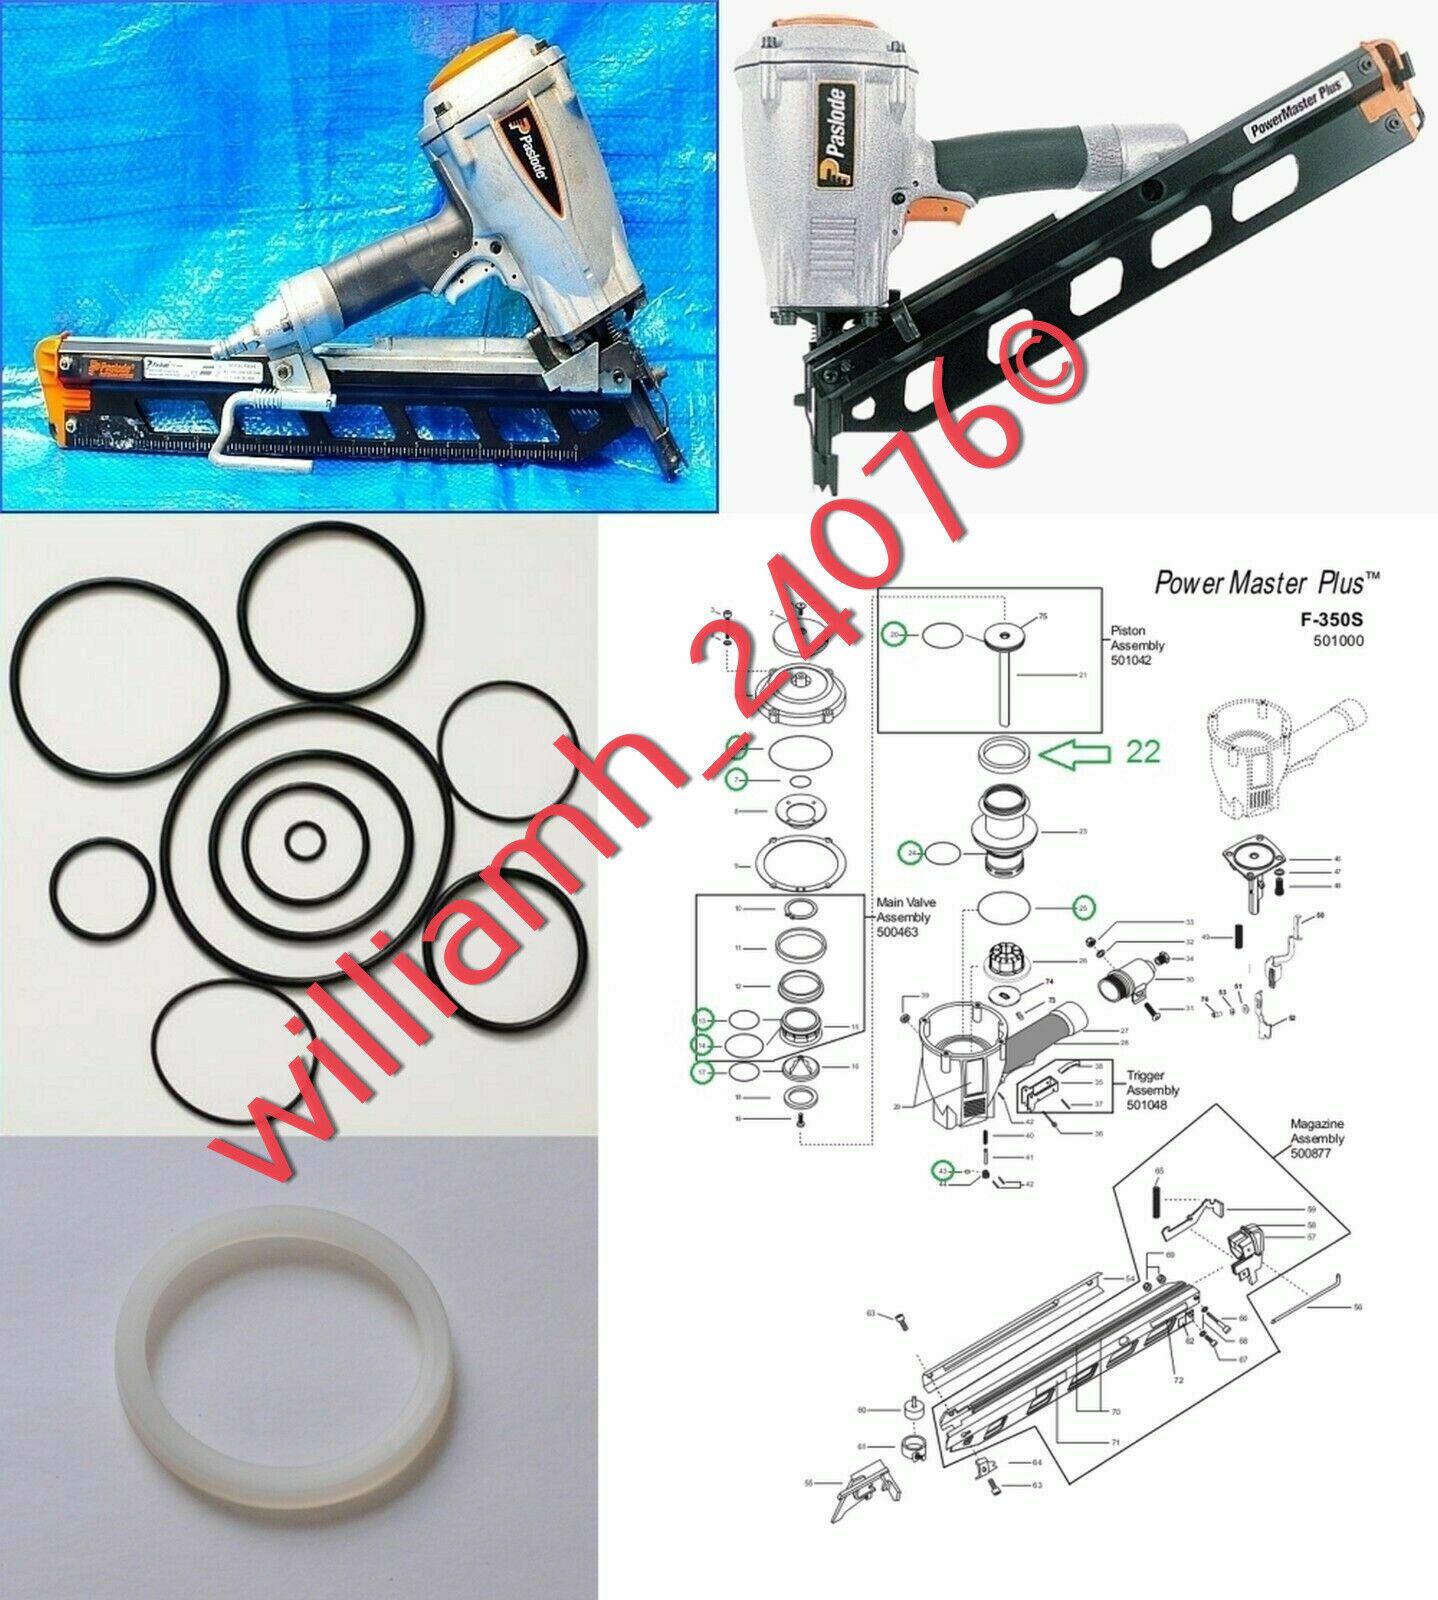 New Paslode Framing Nailer F350-S O-ring and 402011 Cylinder Seal Rebuild Kit.